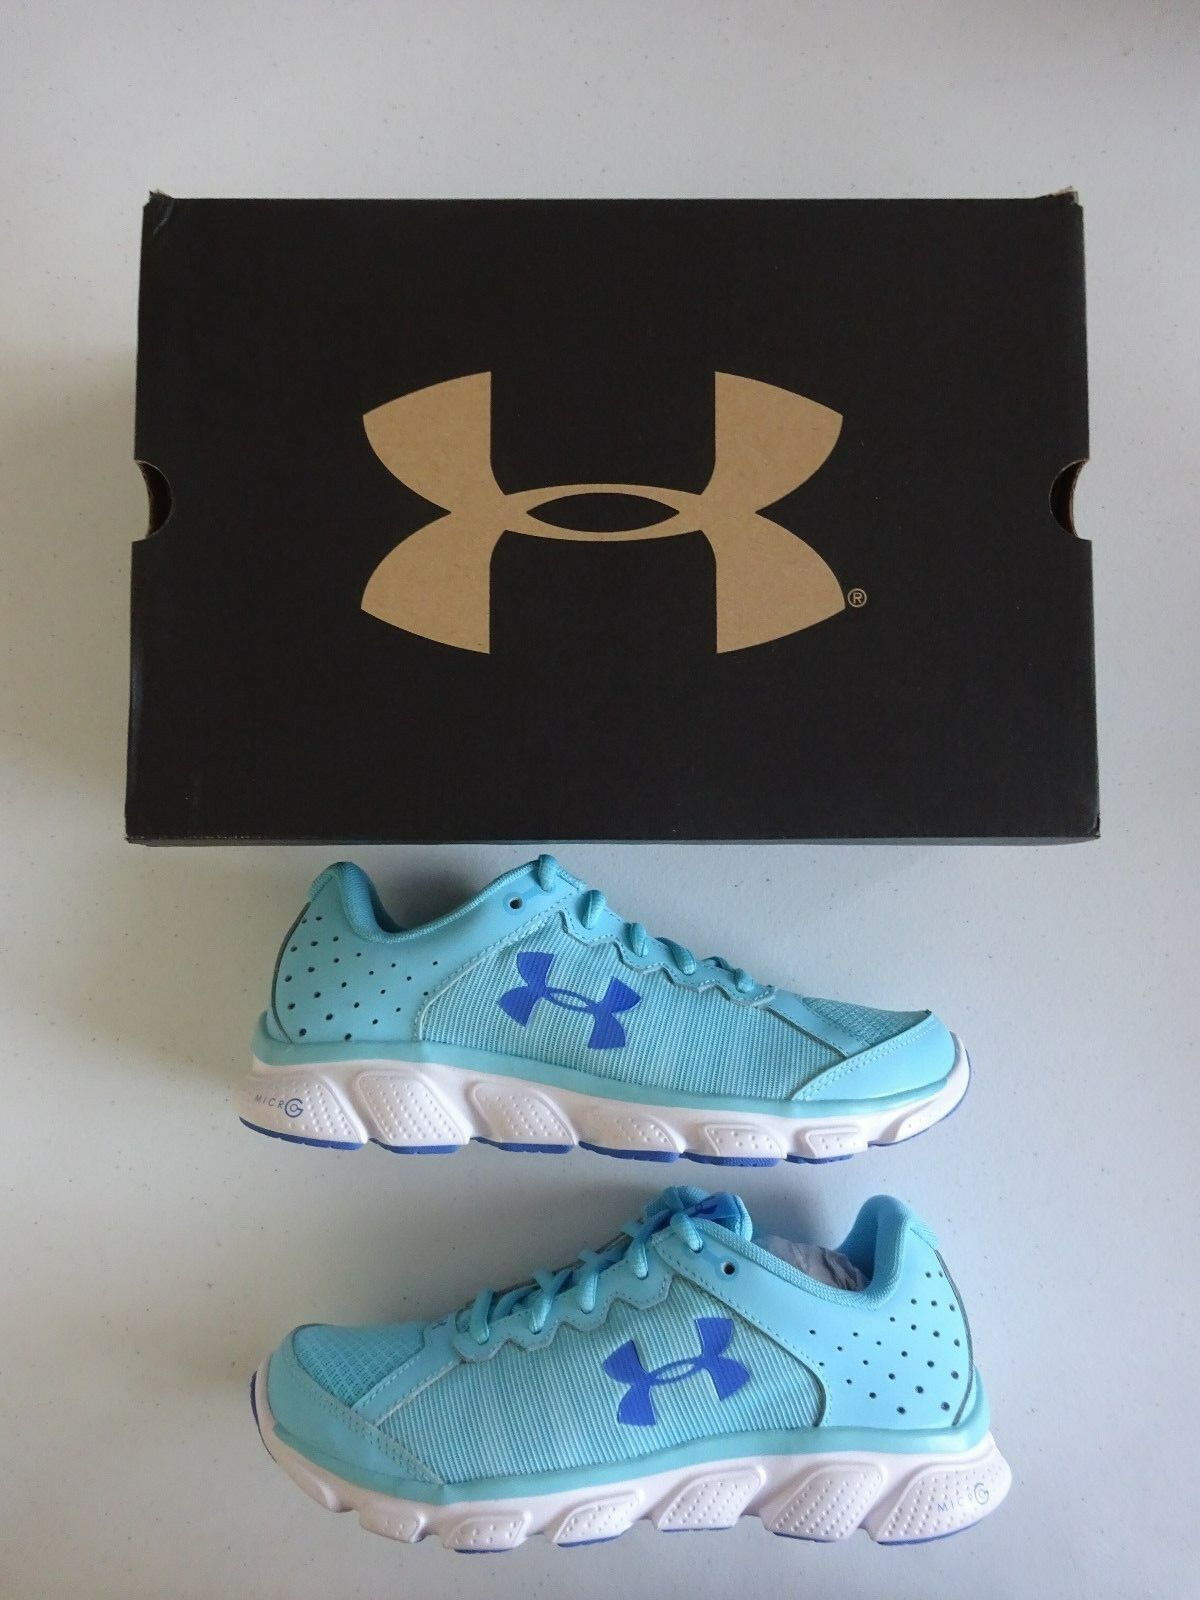 Under Armour Women's Micro G Assert 6 Running Shoes Venetian Blue/White NWT